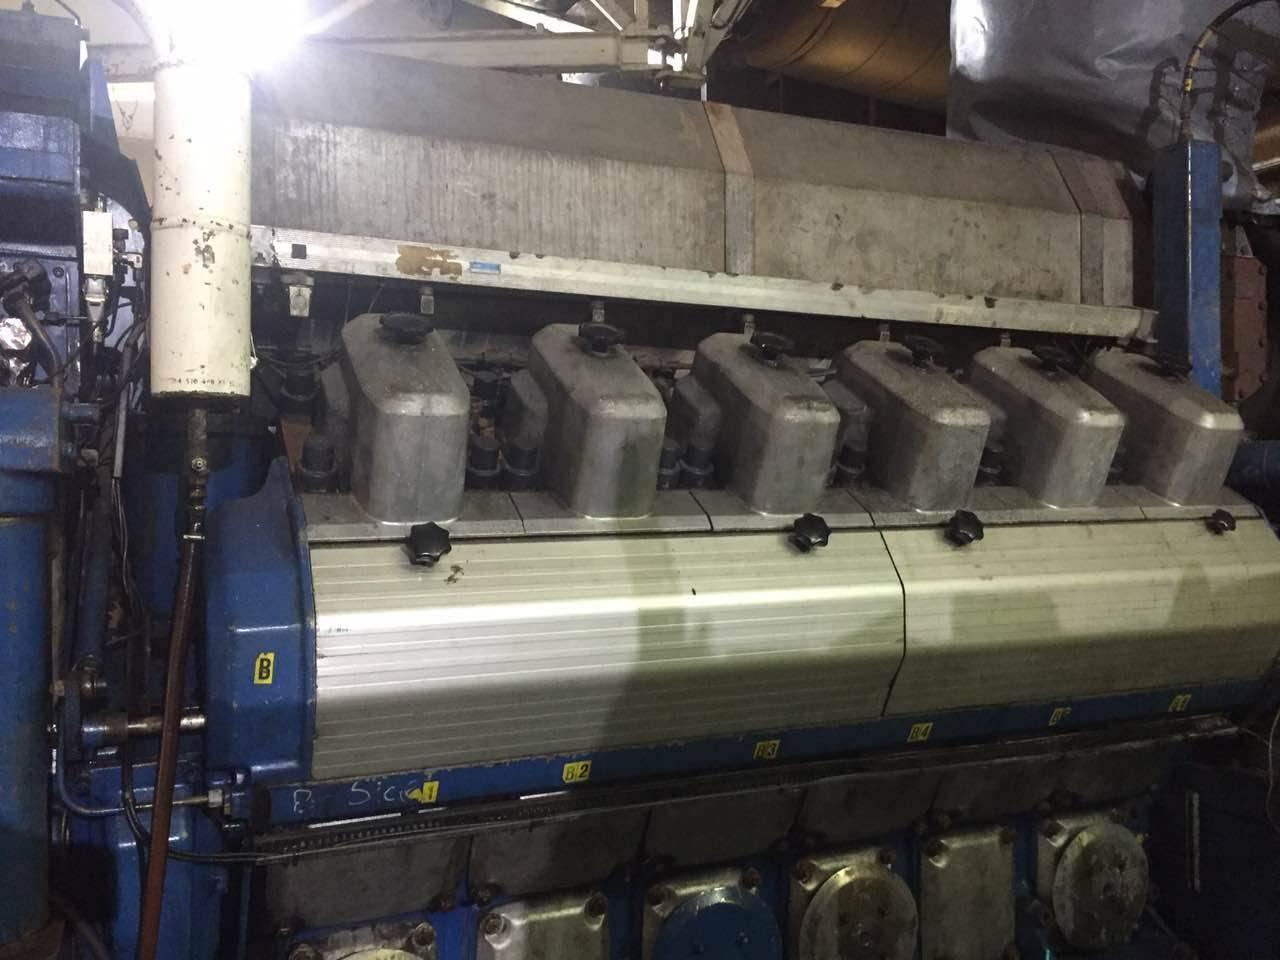 Wartsila 12V200 engine diesel and generator